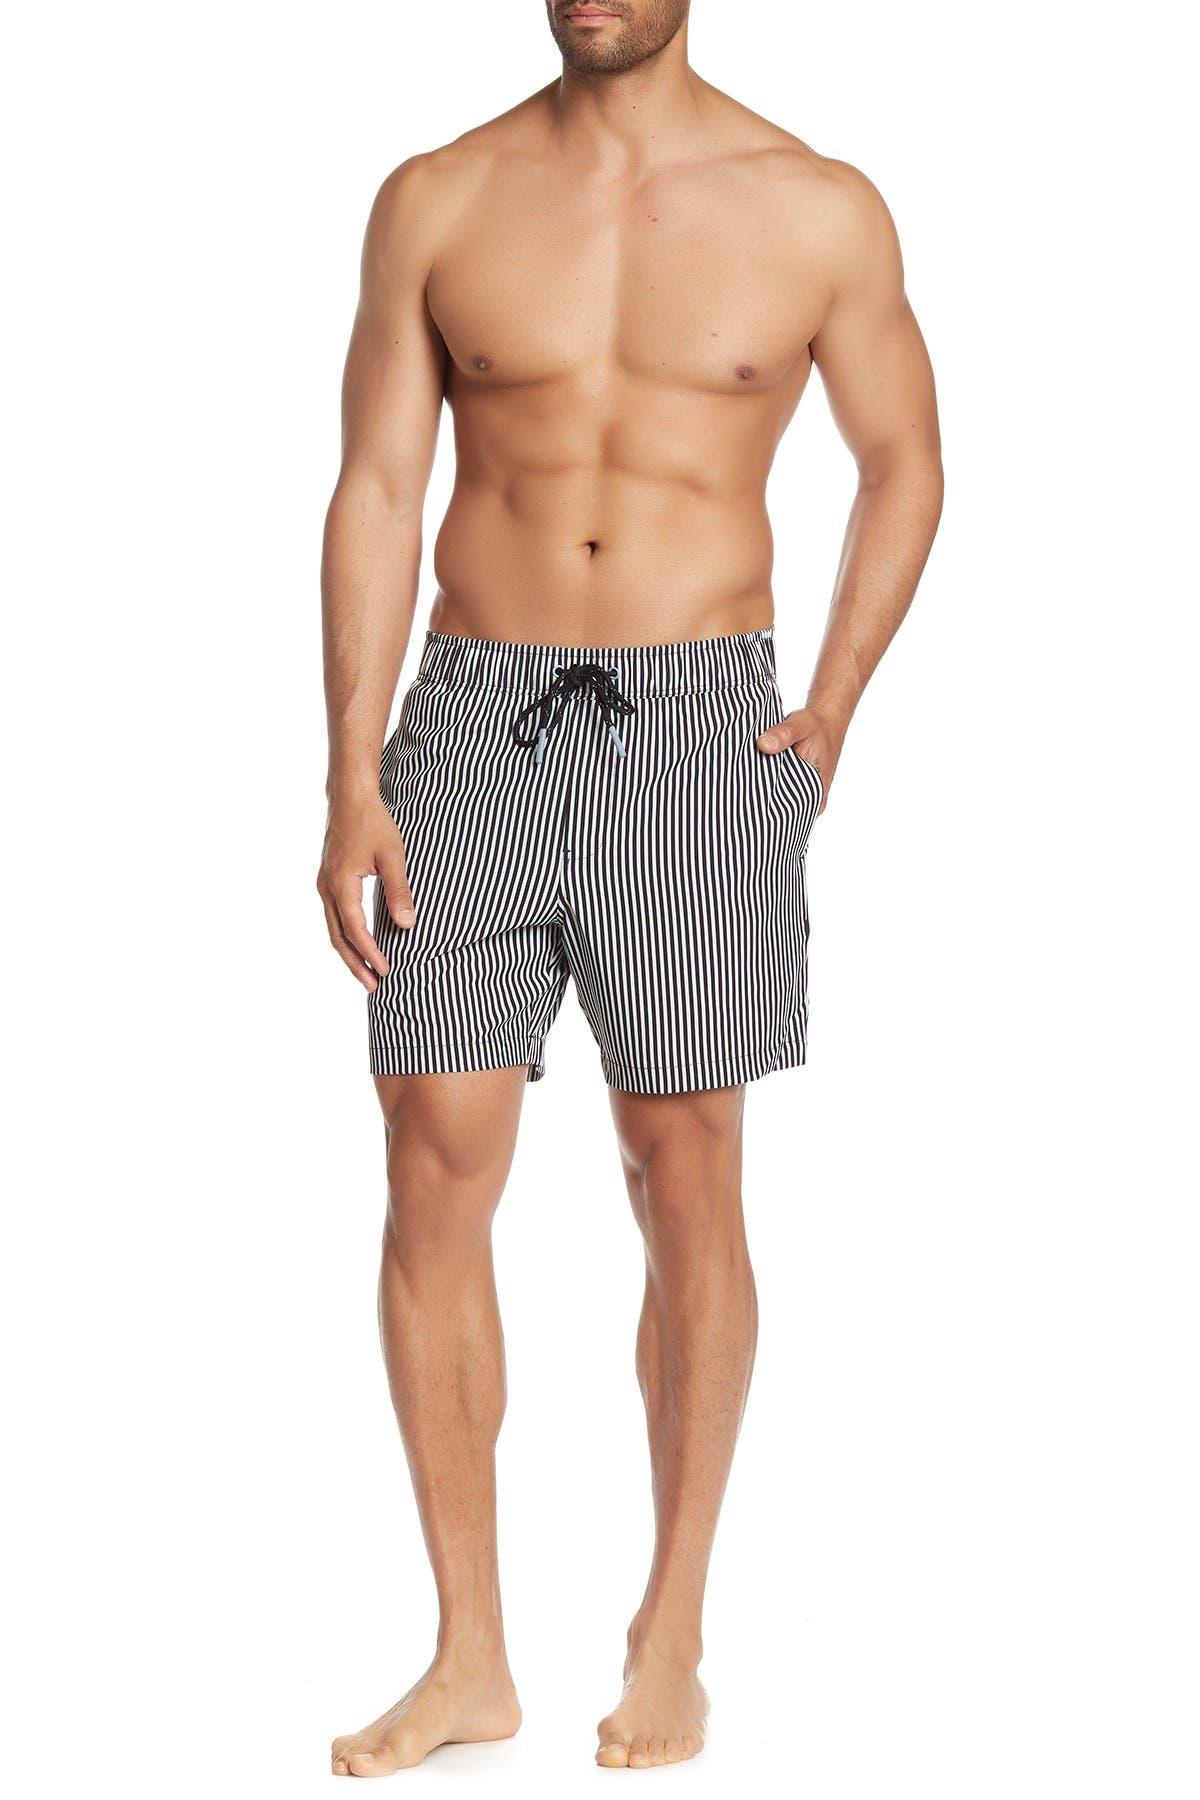 Image of MICHAEL BASTIAN 4 Way Stretch Vertical Striped Swim Shorts